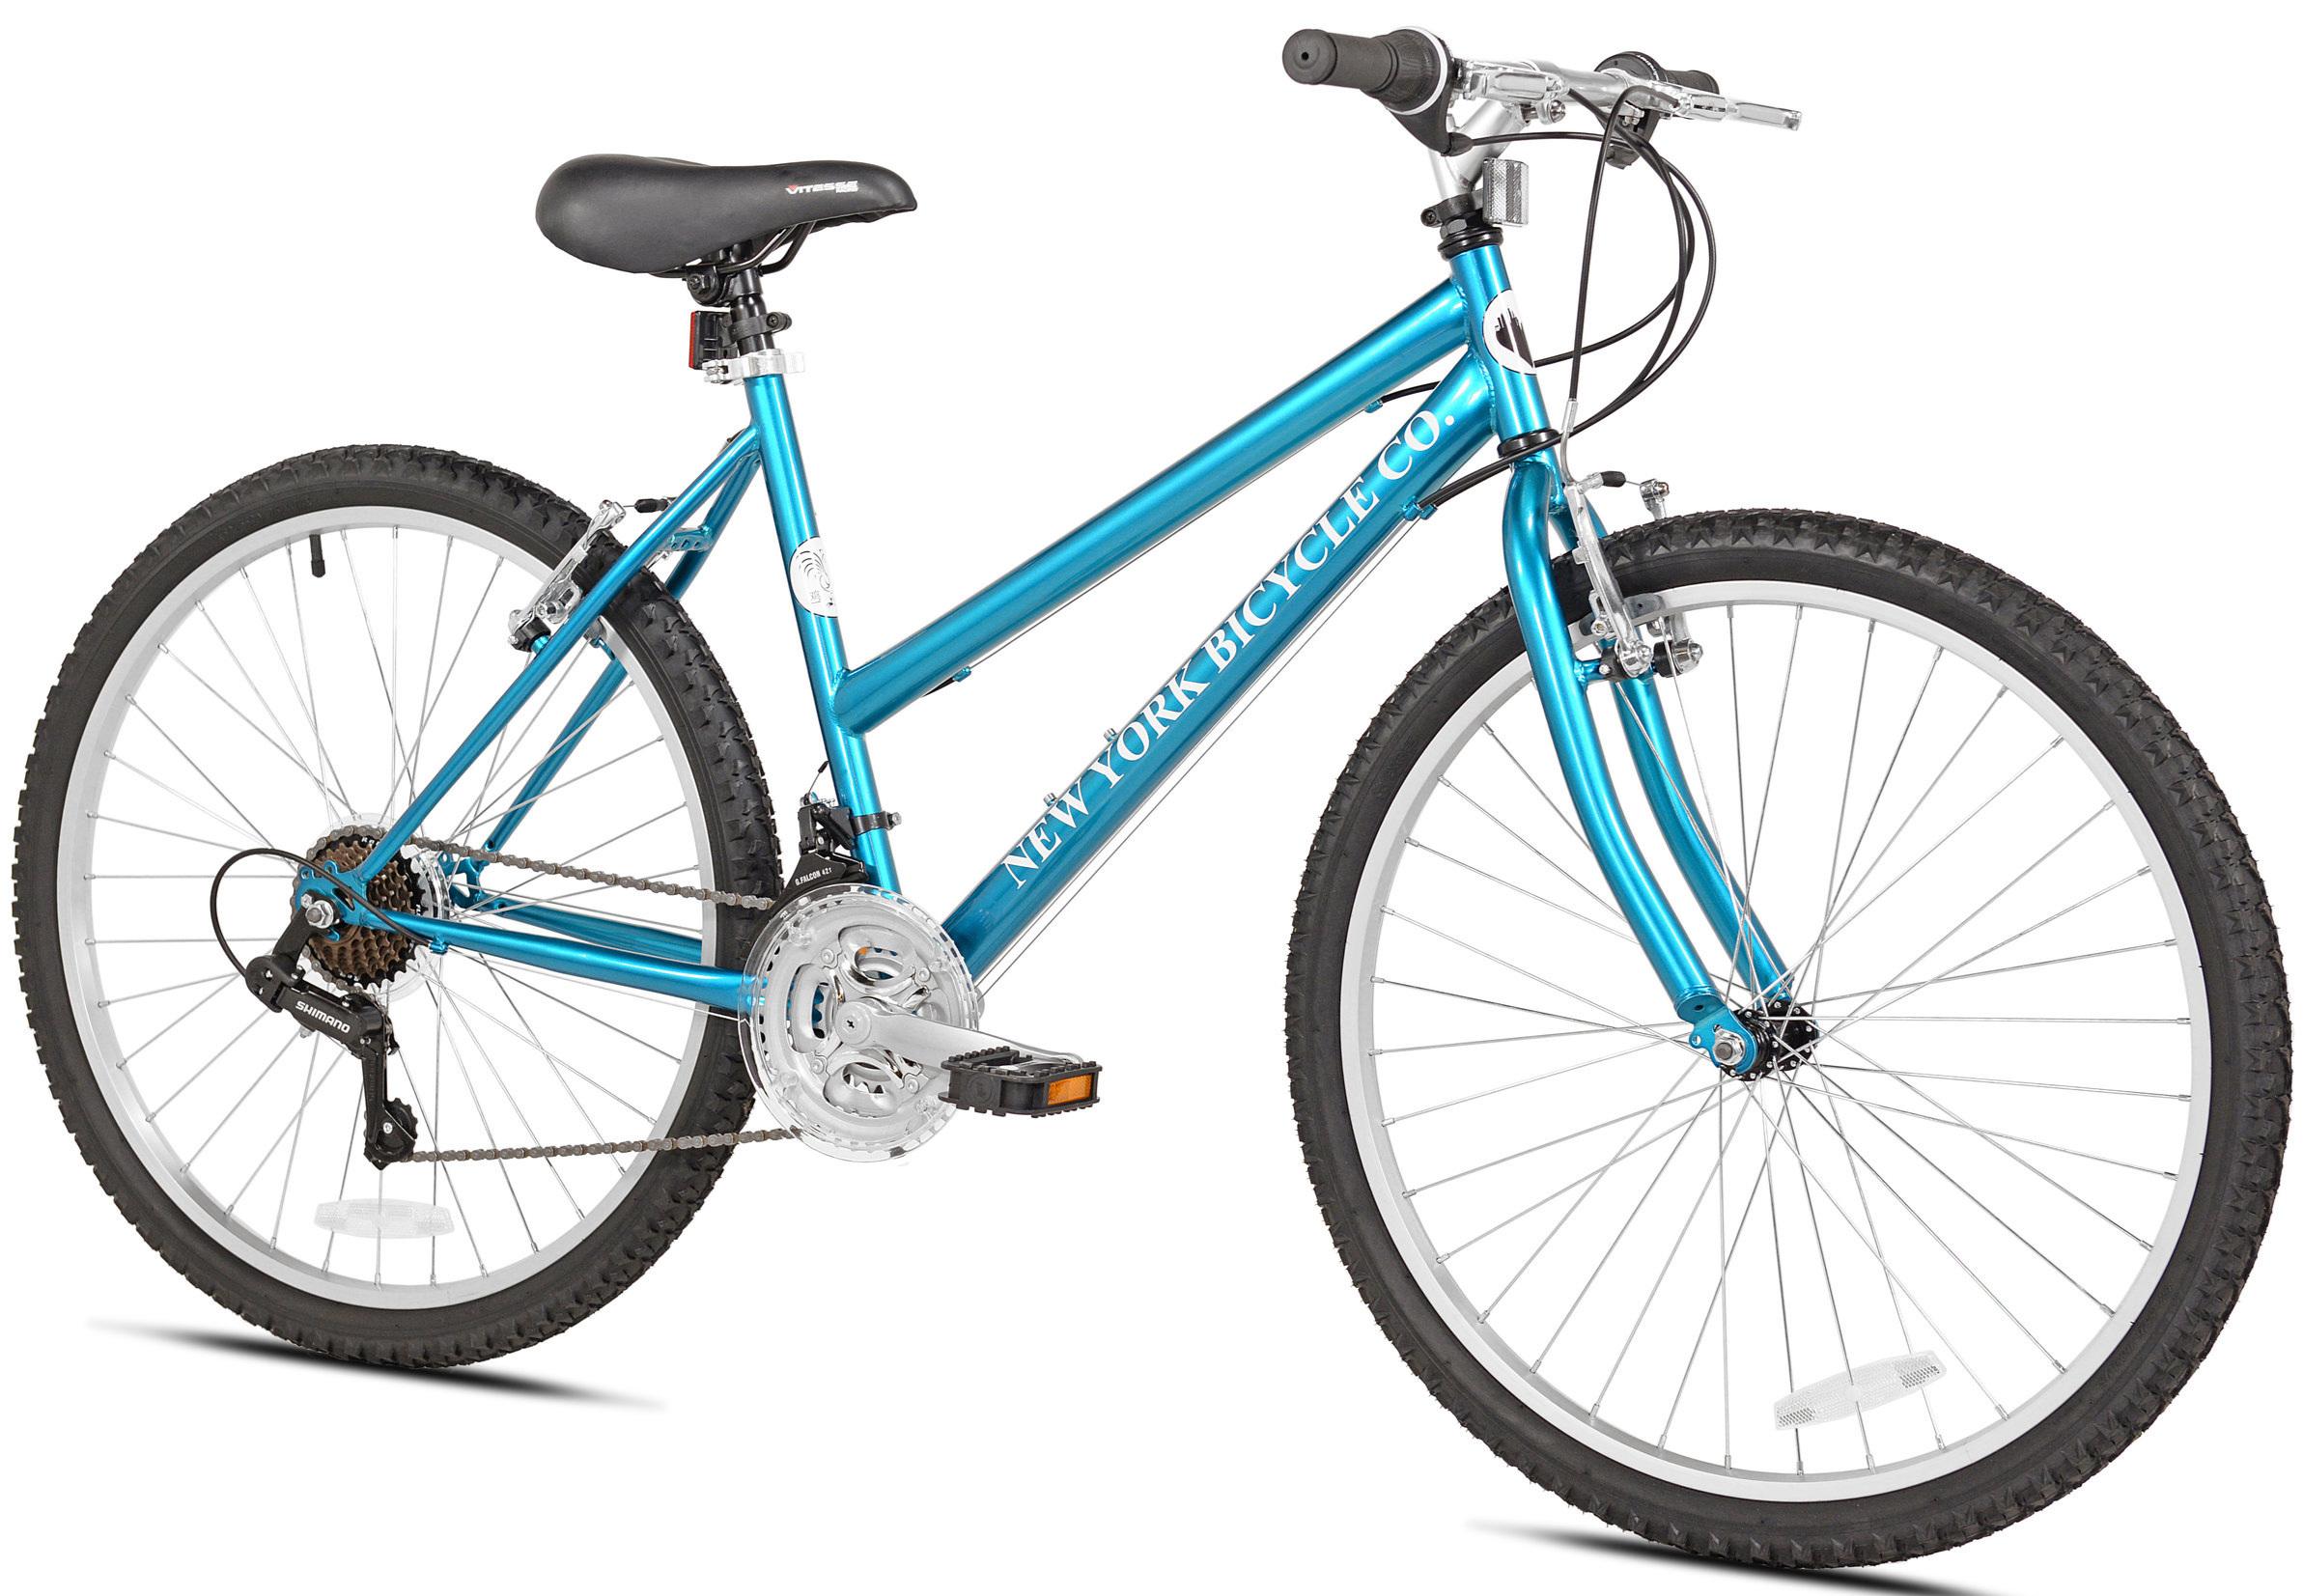 New York Bicycle Co. WATB-26